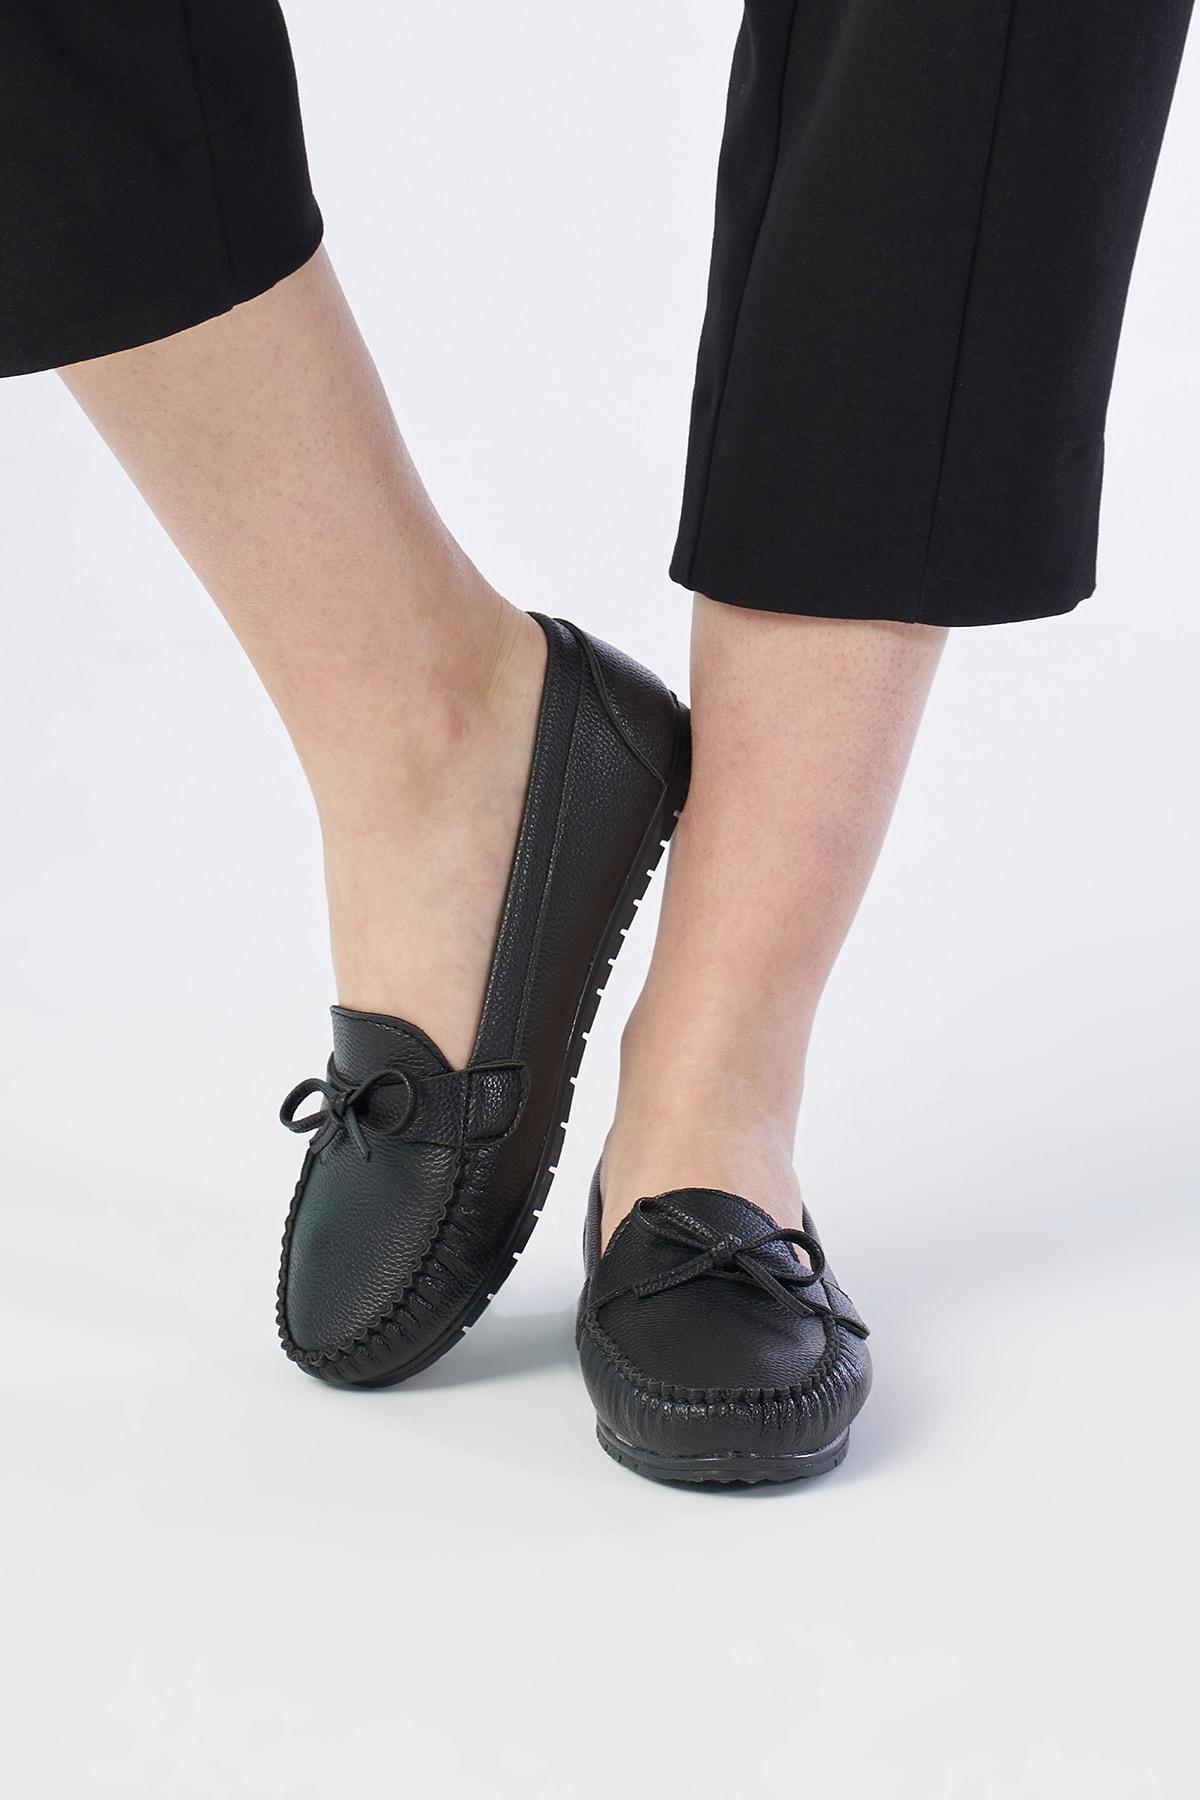 OCT Shoes Siyah Kadın Fiyonk Babet TS1024 2